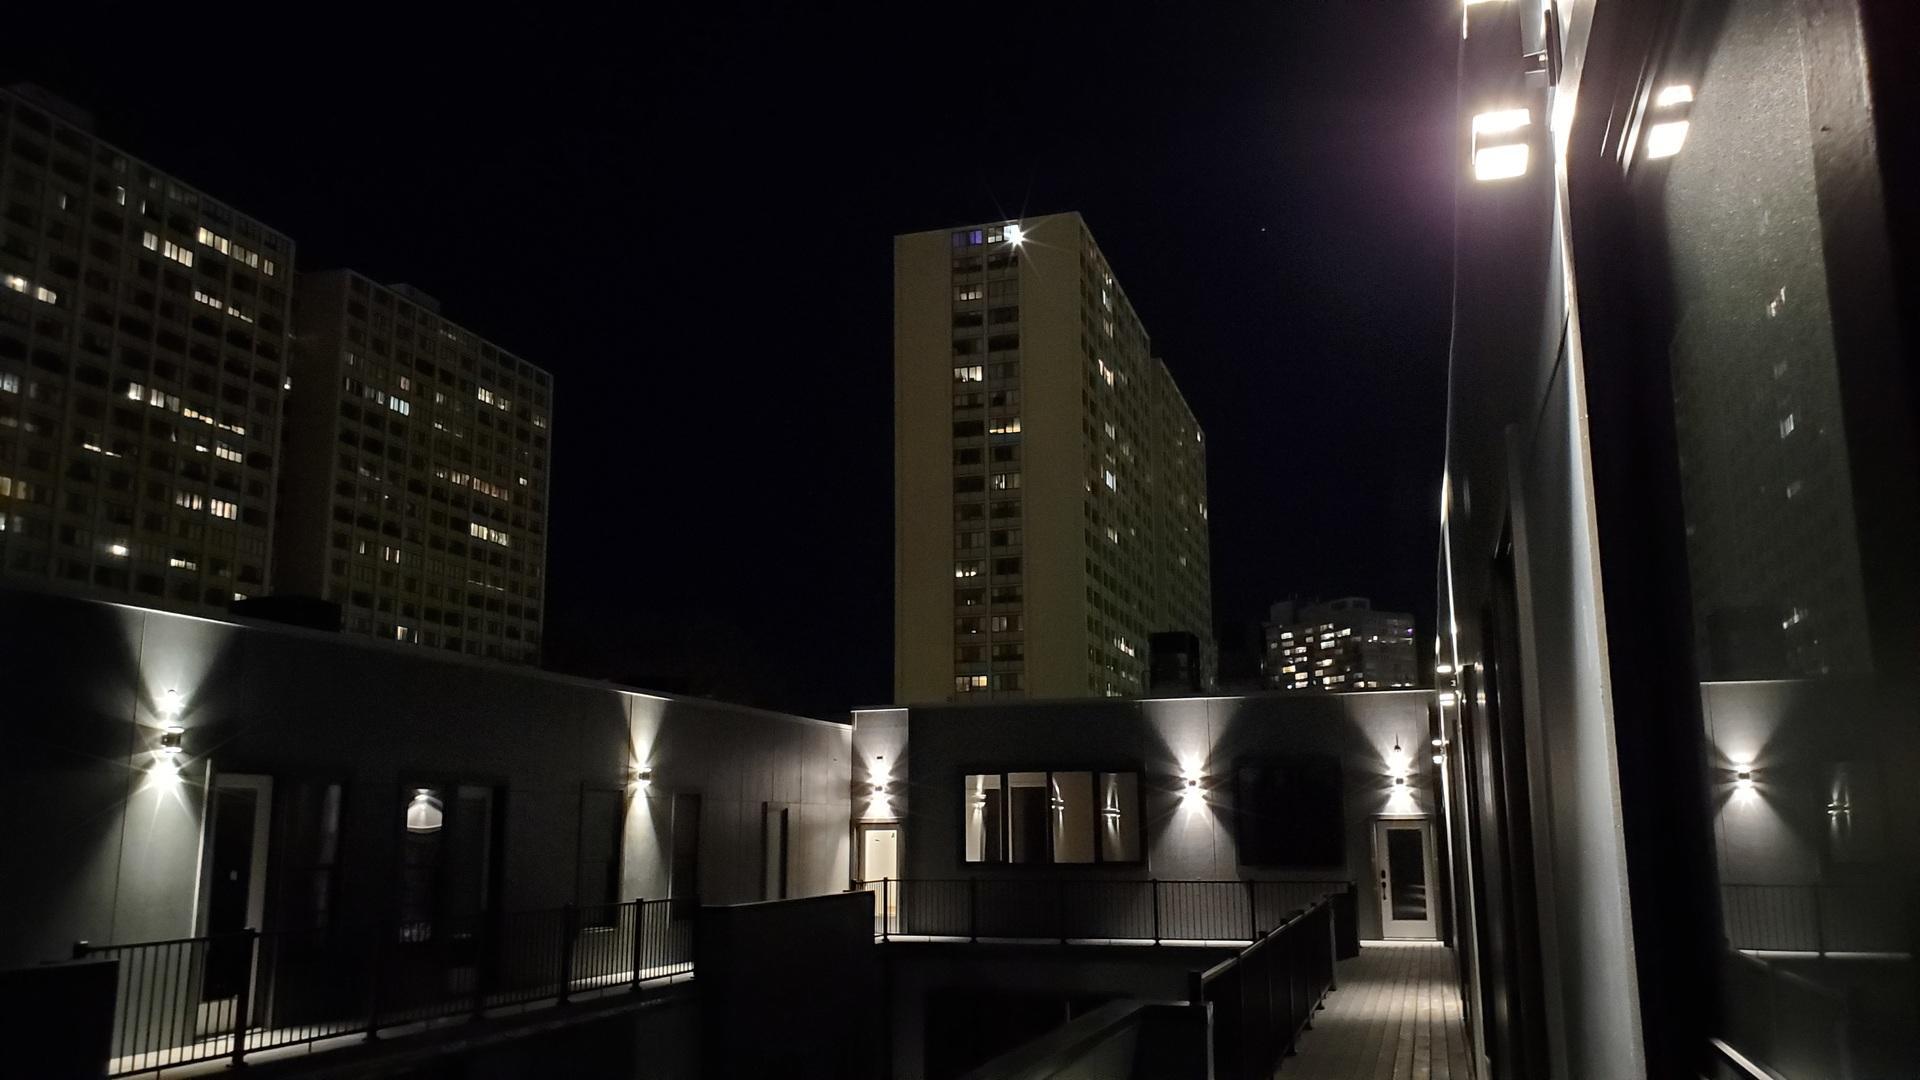 4840 S Dorchester  Avenue, Unit 13 photo